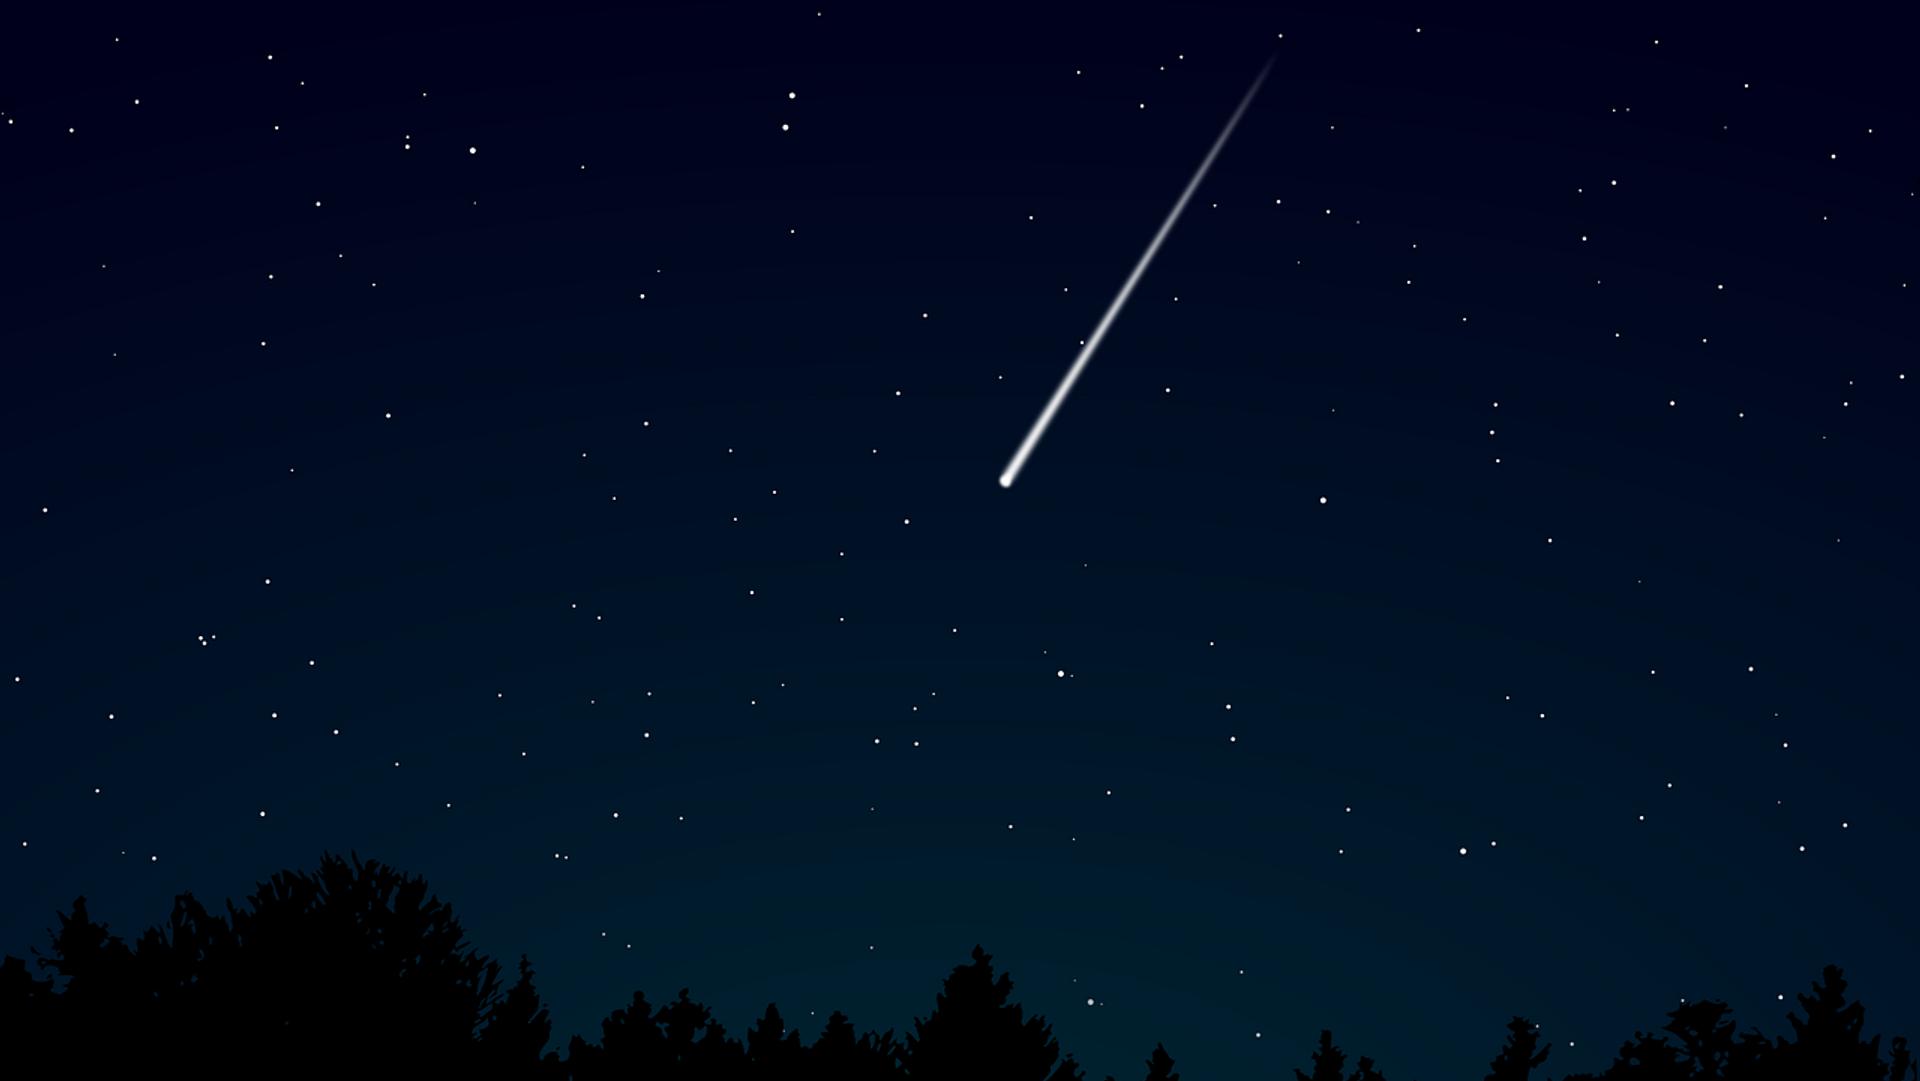 Meteor (Symbolbild) - SNA, 1920, 12.10.2021